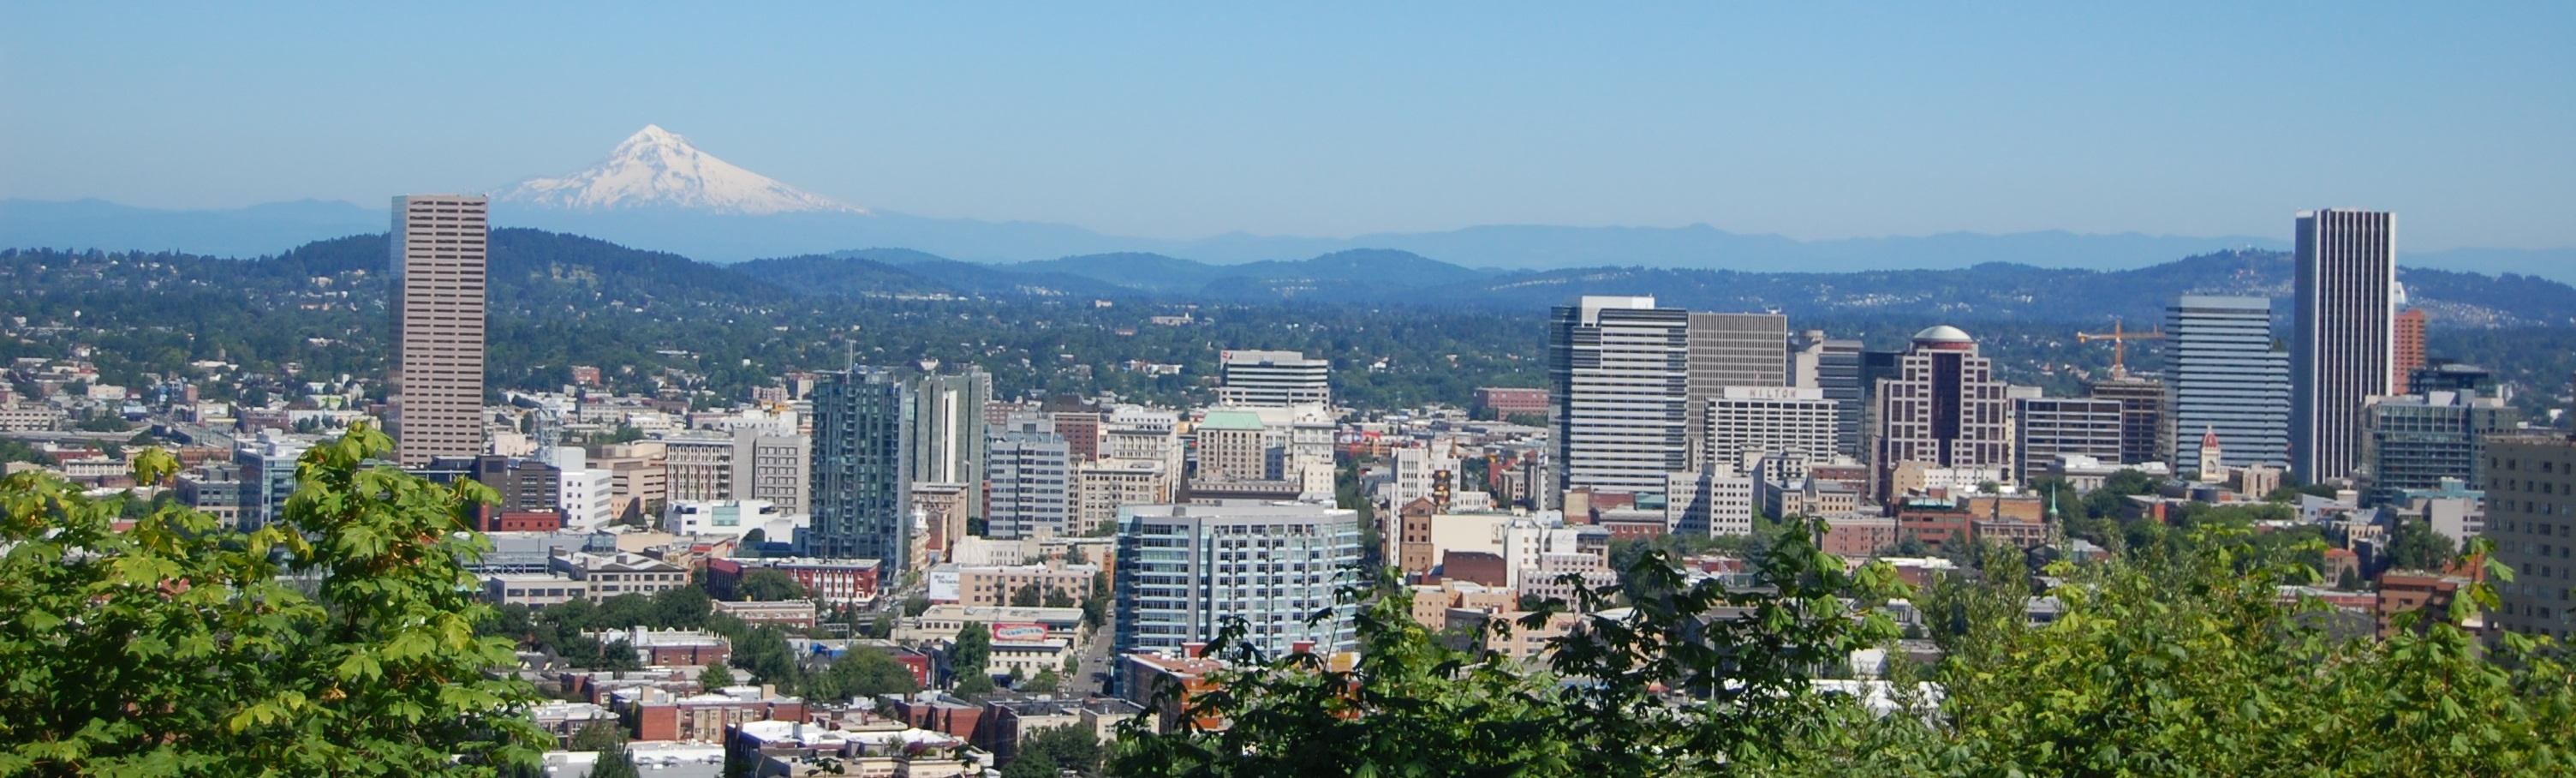 Portland_and_Mt_Hood